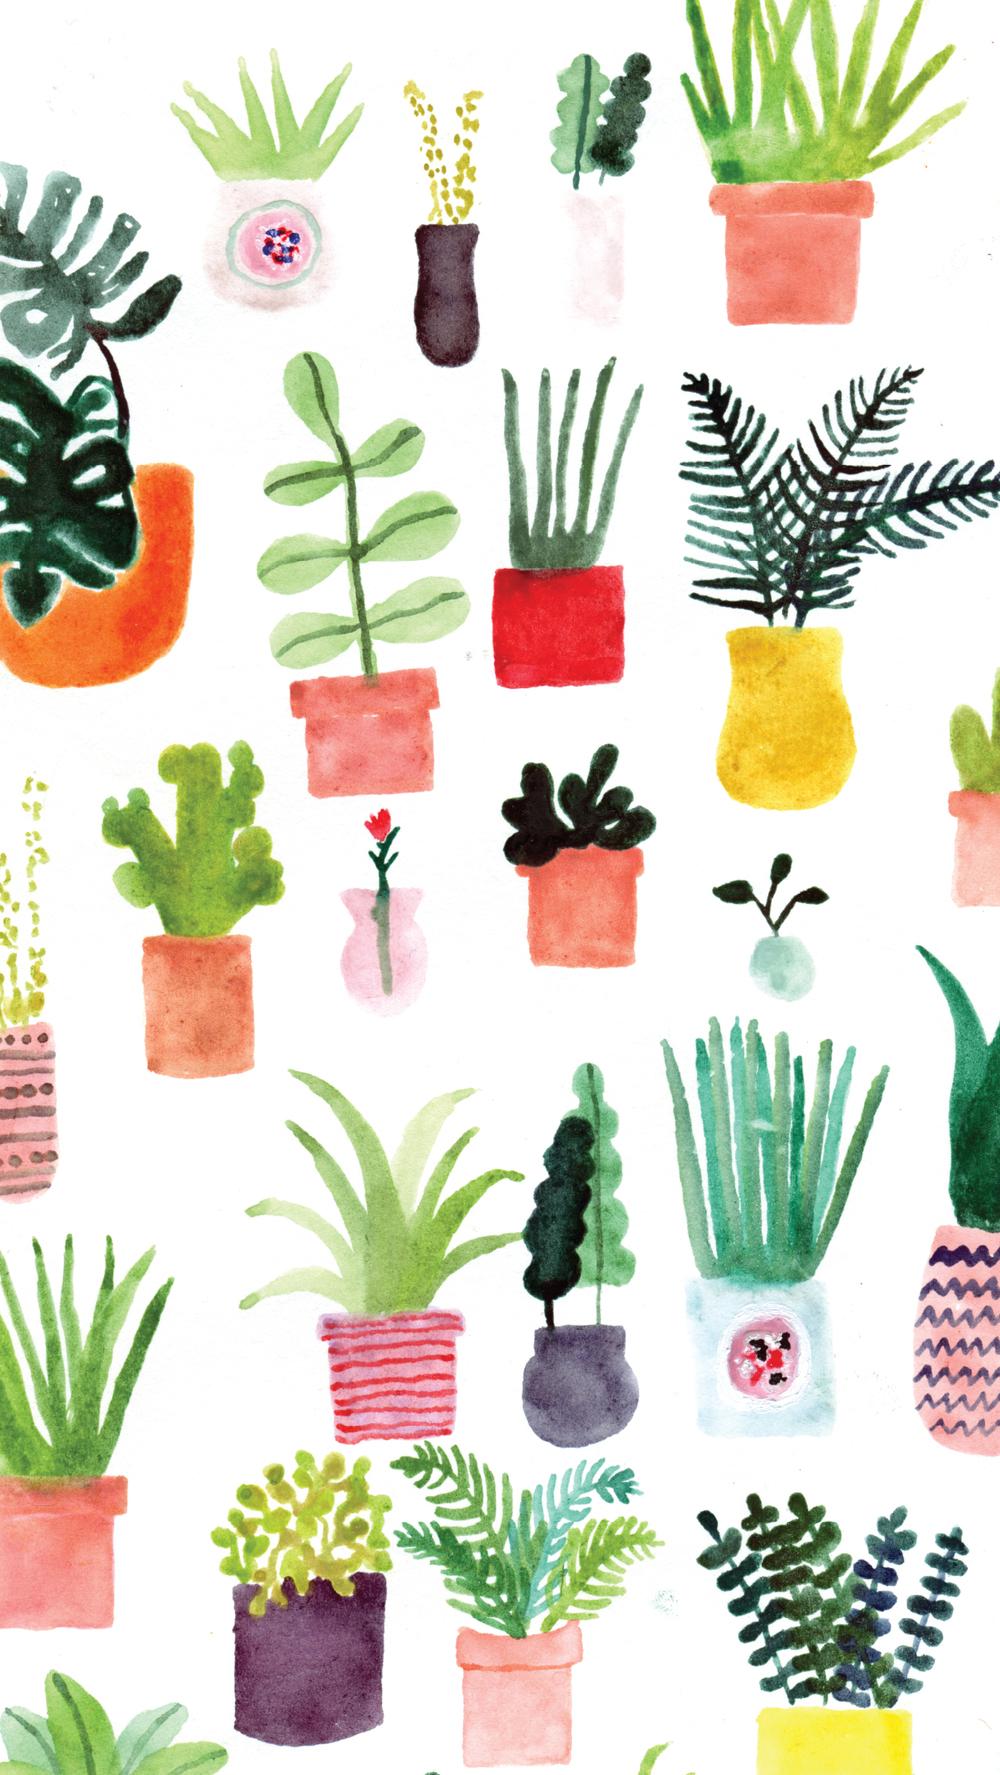 allie-newman_plants_mobile